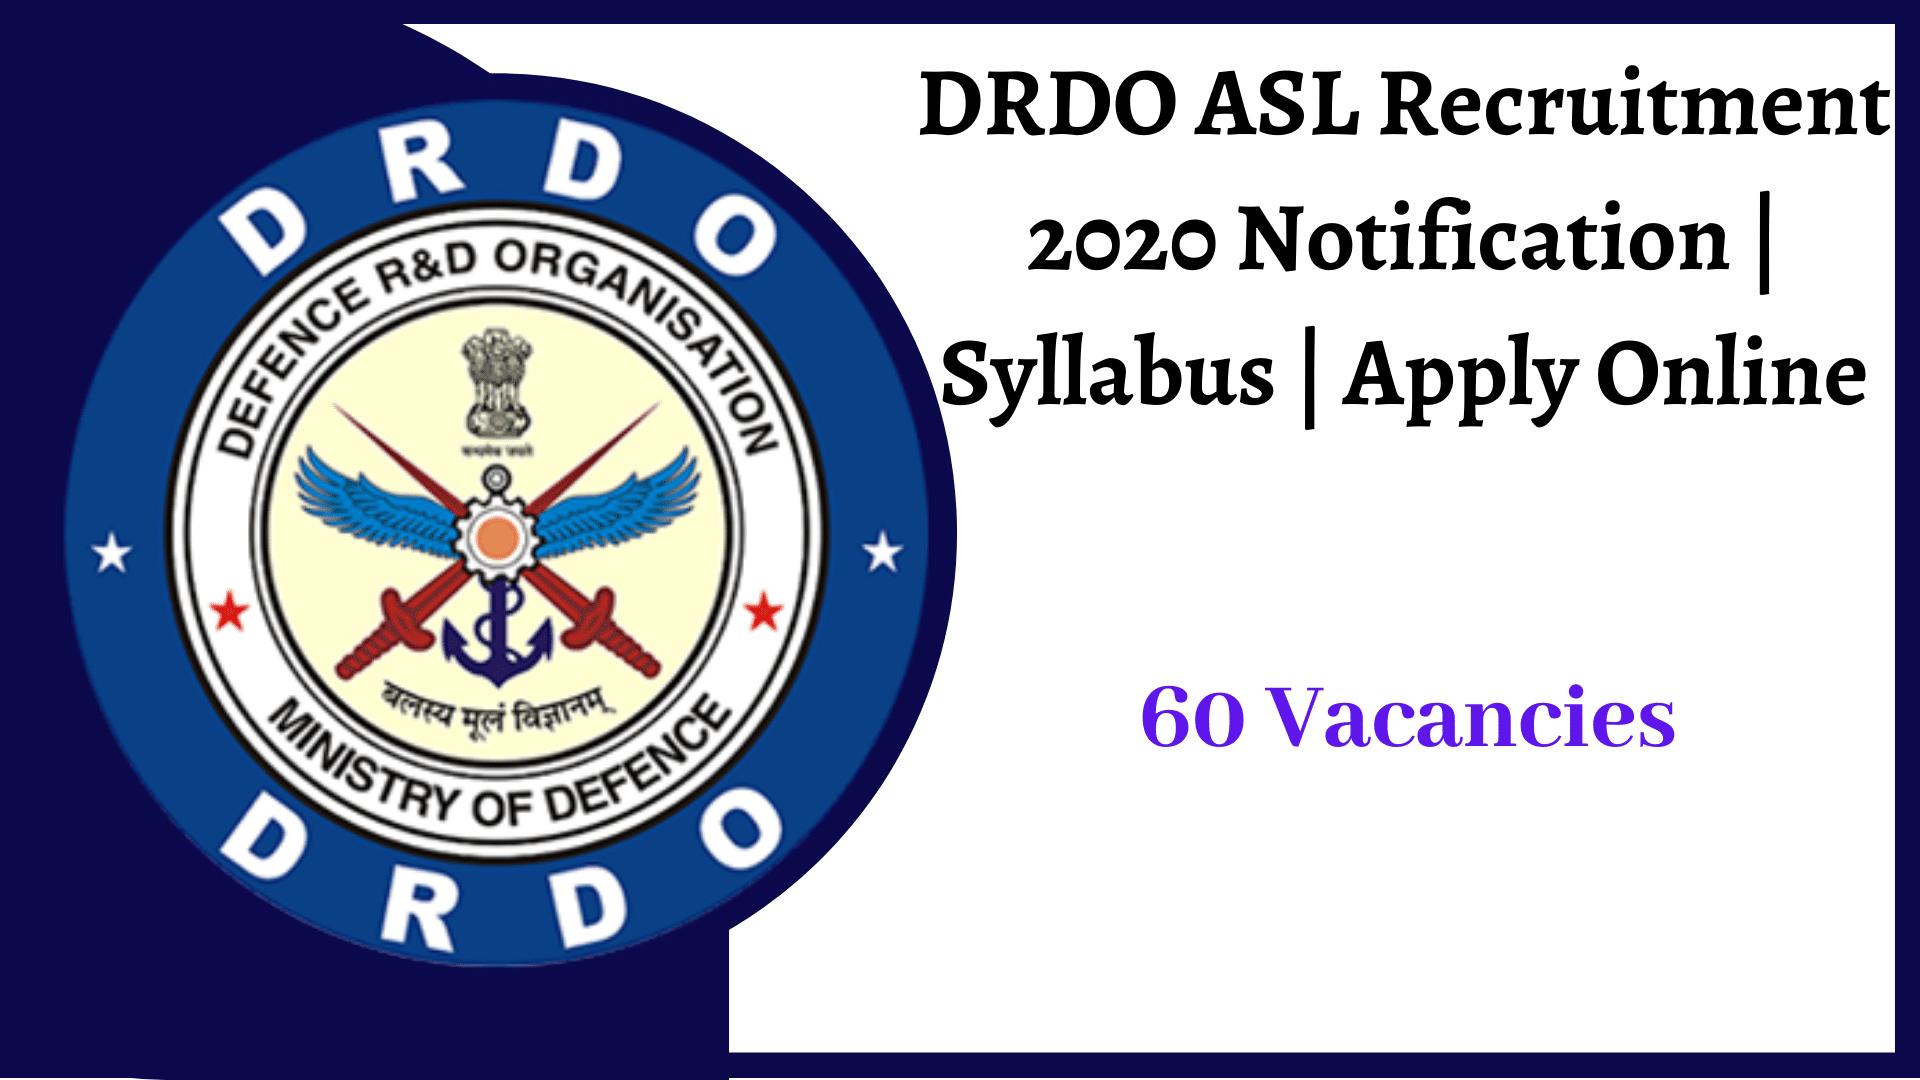 DRDO ASL Recruitment 2020 Notification | Syllabus | Apply Online